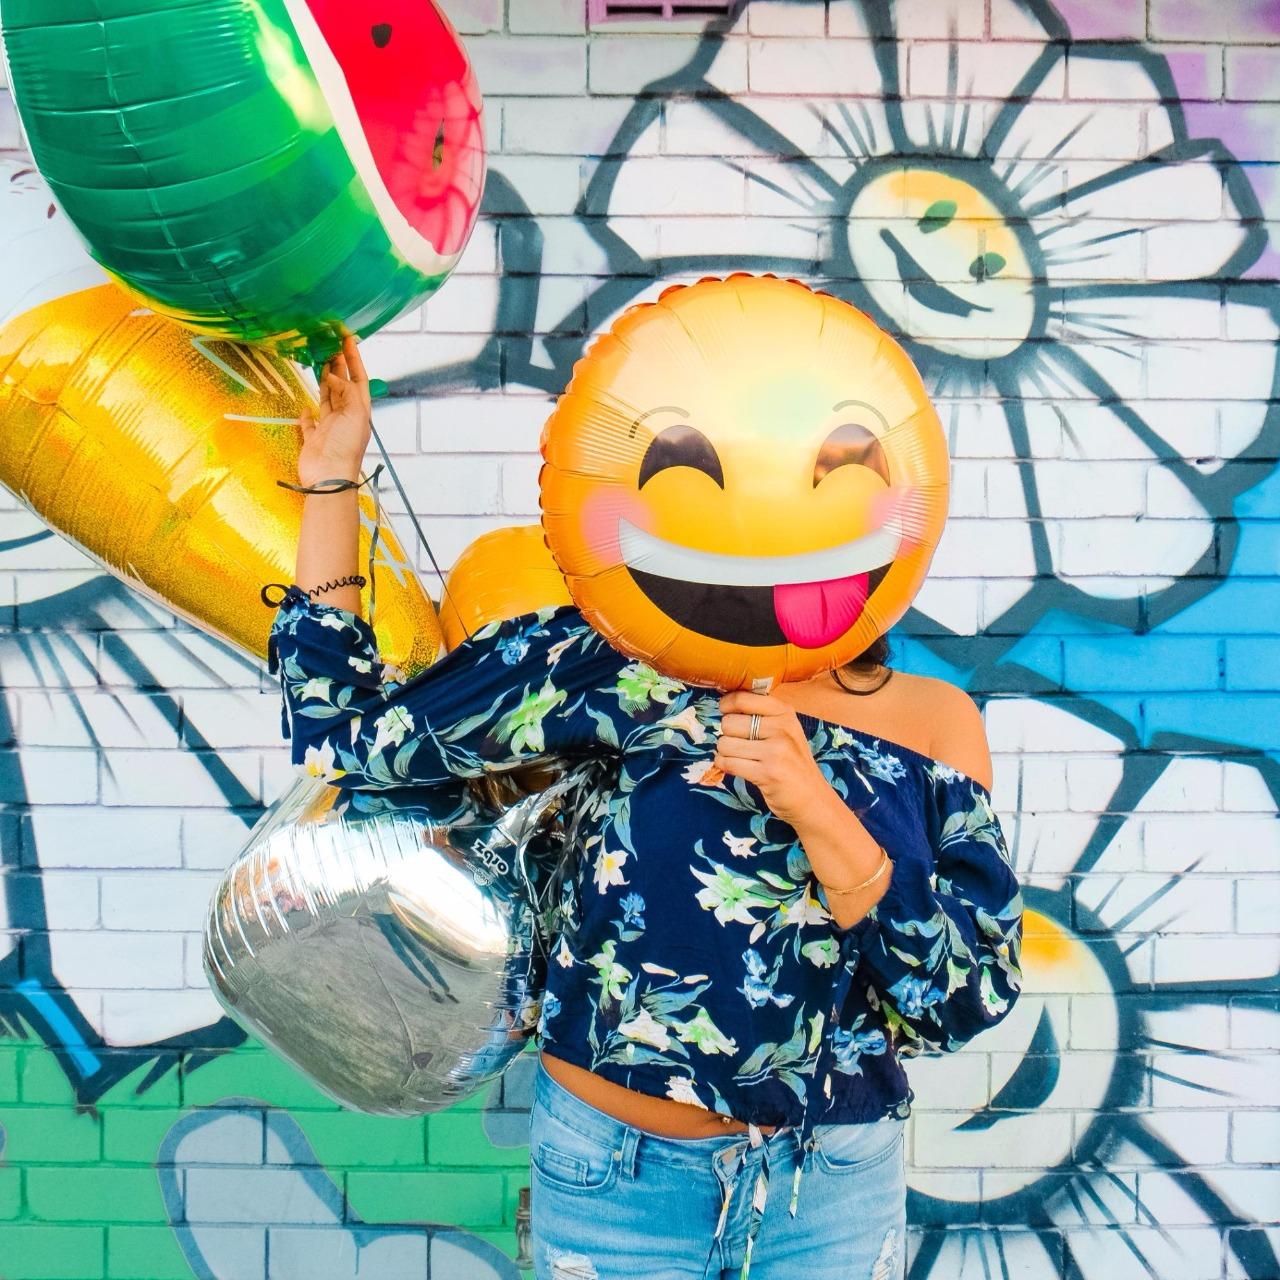 10 ways to improve employee satisfaction